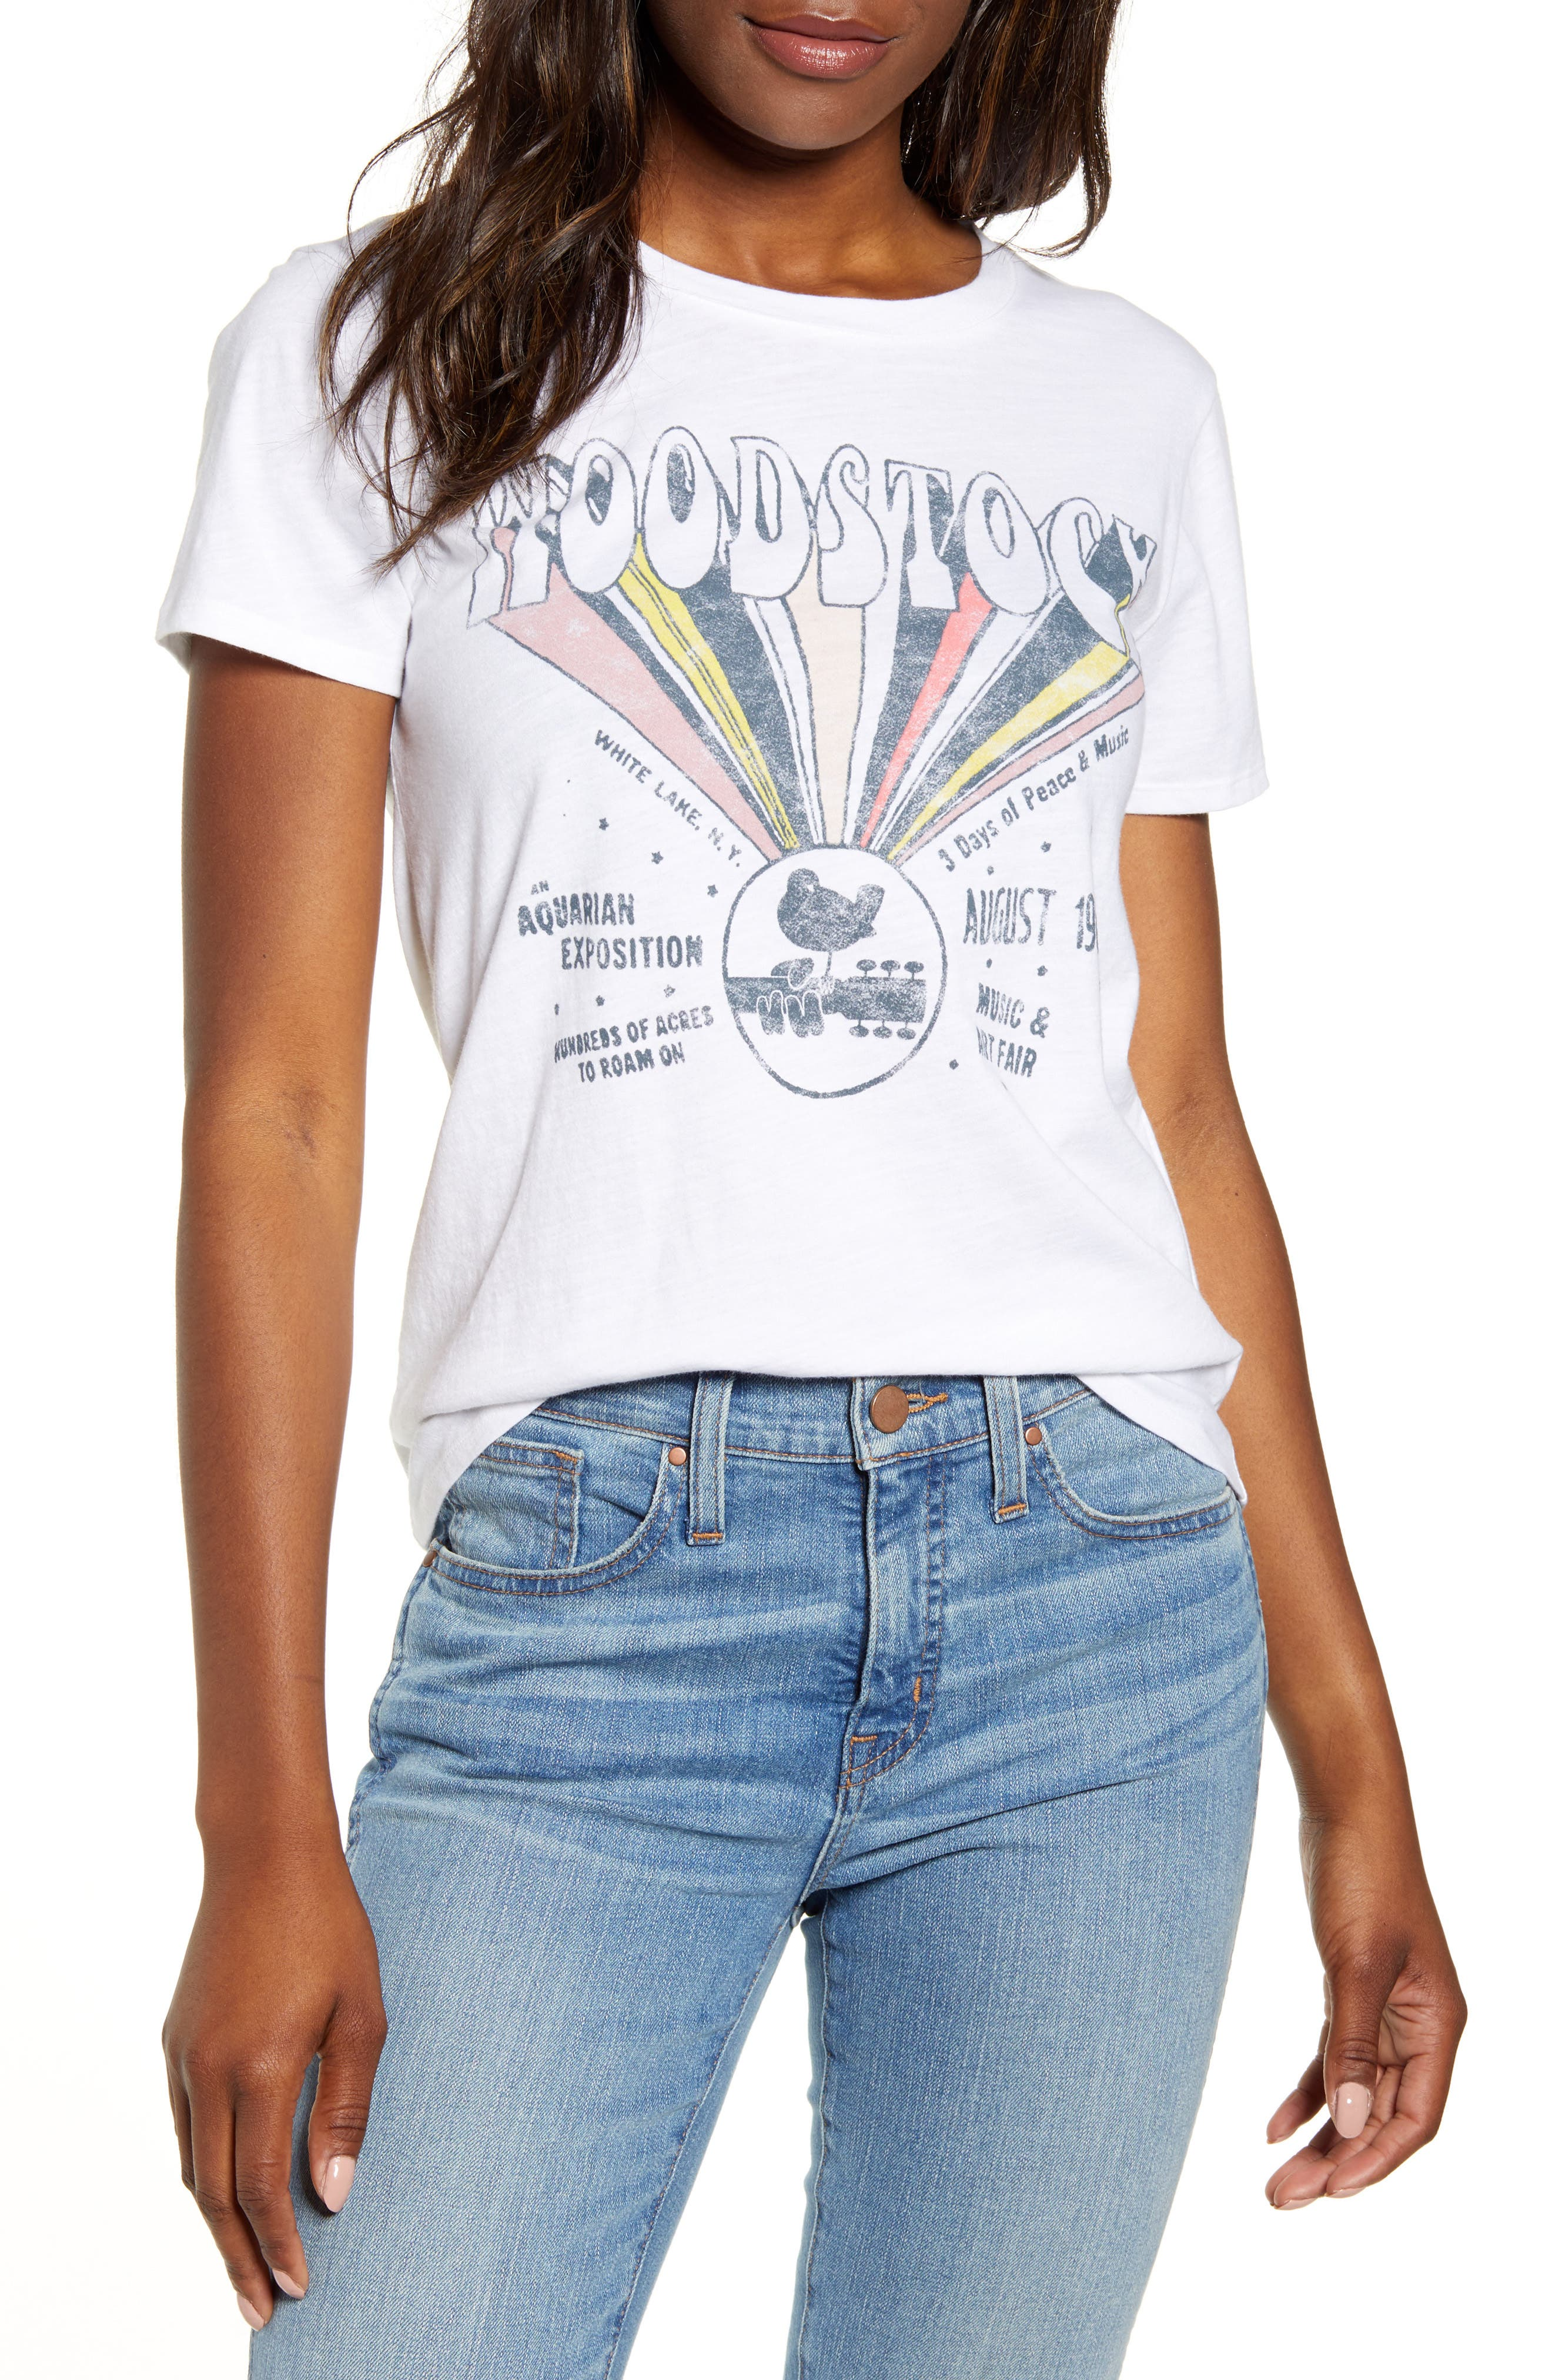 Women's 70s Shirts, Blouses, Hippie Tops Womens Lucky Brand Woodstock Crewneck Tee $35.55 AT vintagedancer.com